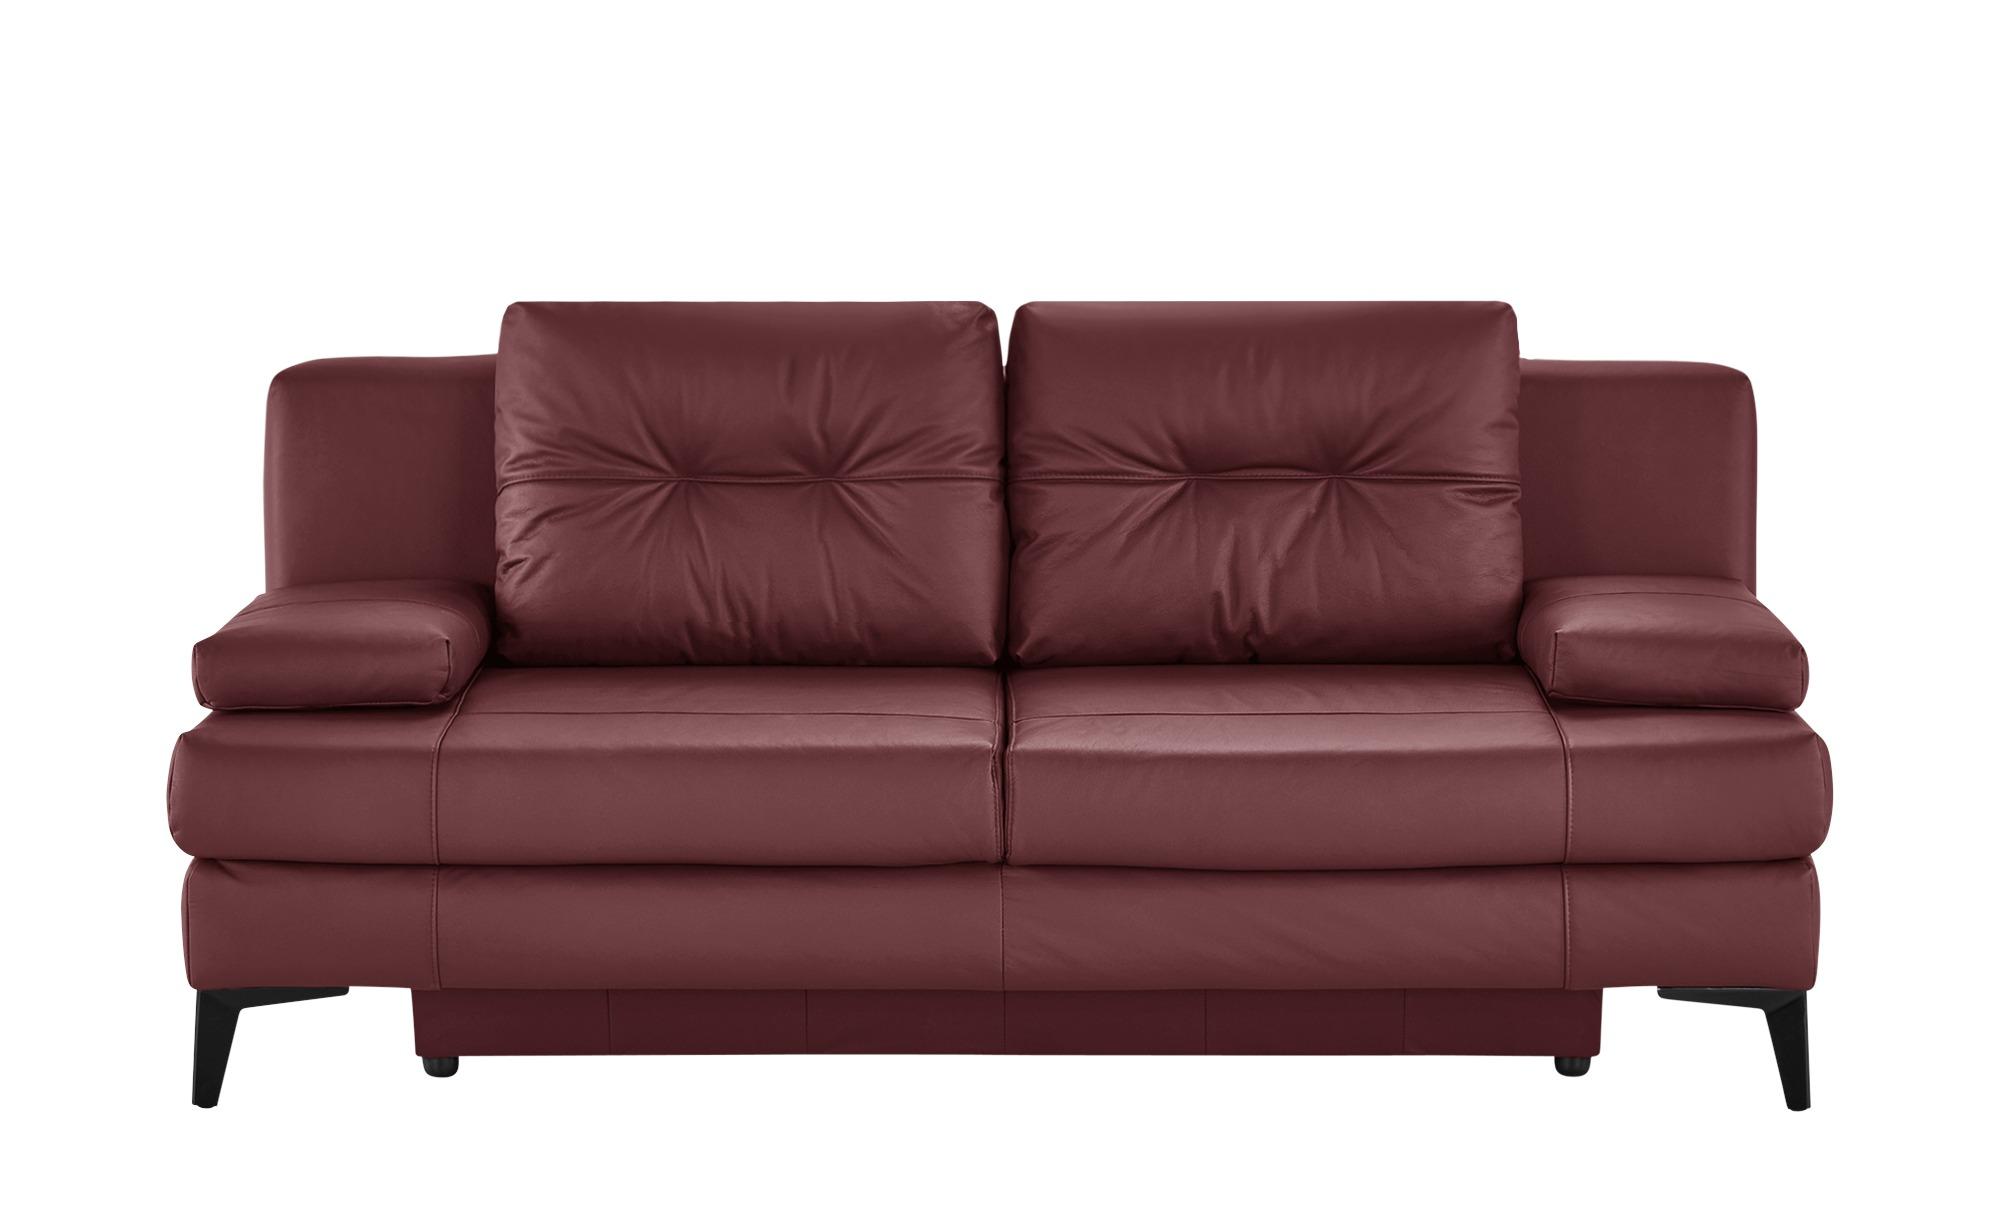 Ledersofa  Svea ¦ rot ¦ Maße (cm): B: 202 H: 92 T: 100 Polstermöbel > Sofas > 2-Sitzer - Höffner